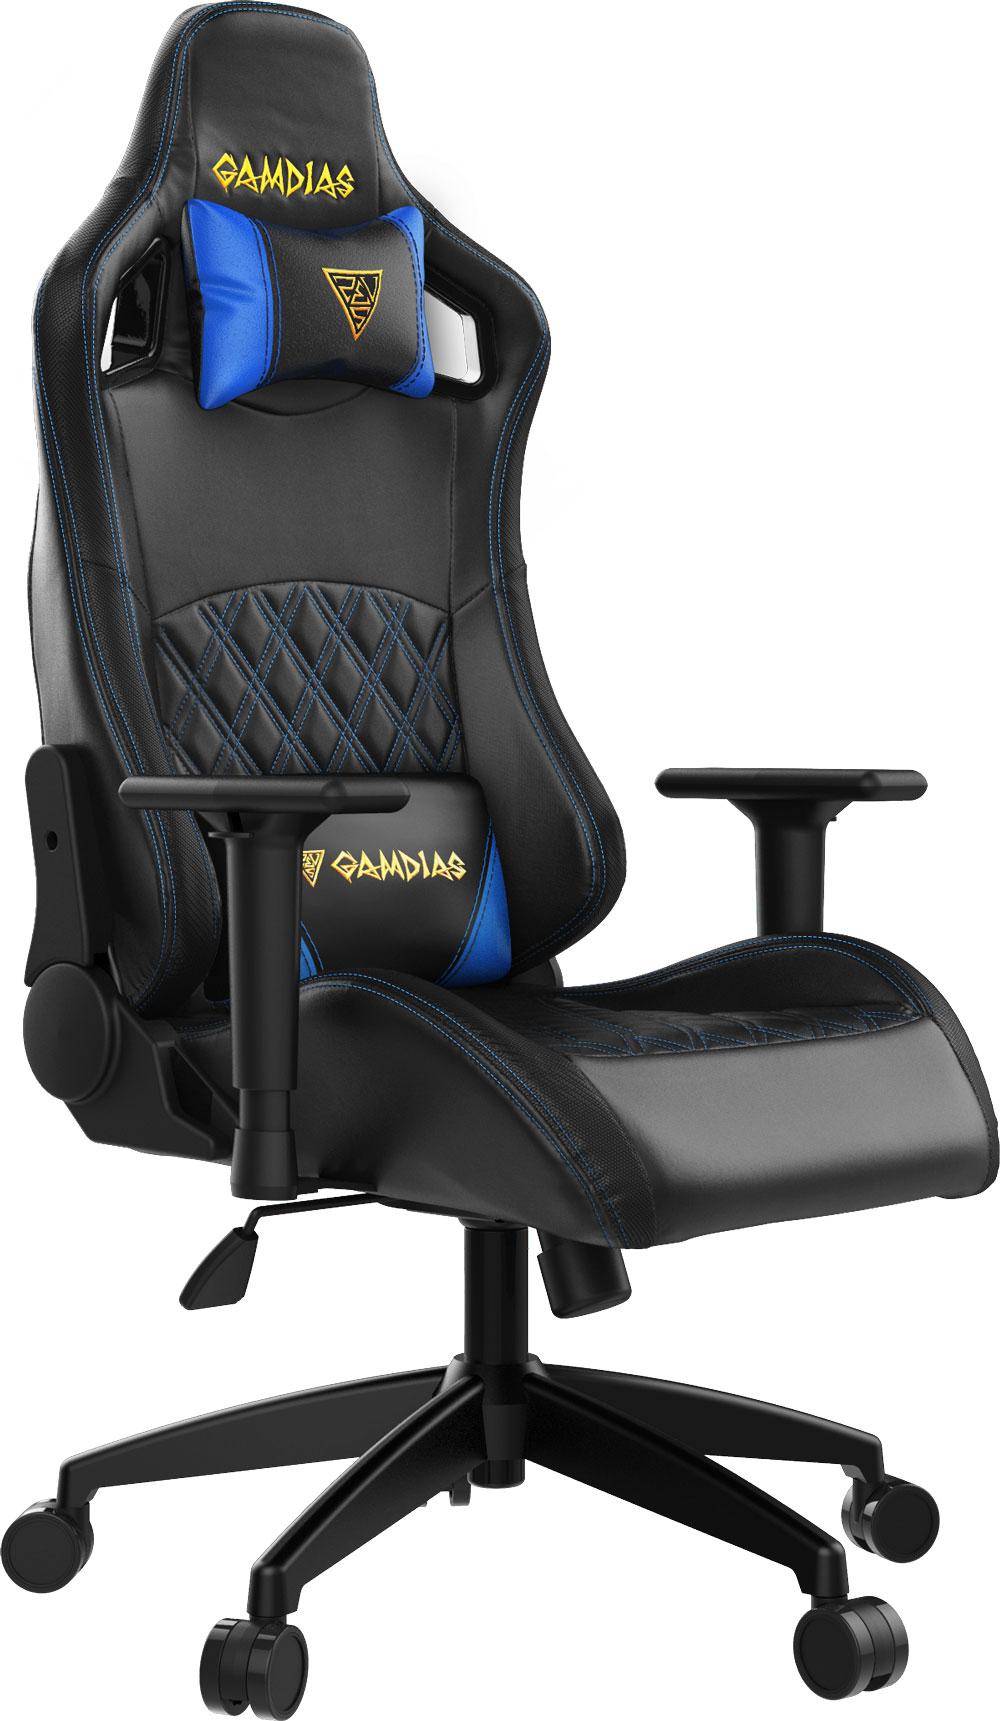 Gamdias Aphrodite EF1 Gaming Chair - Black/Blue